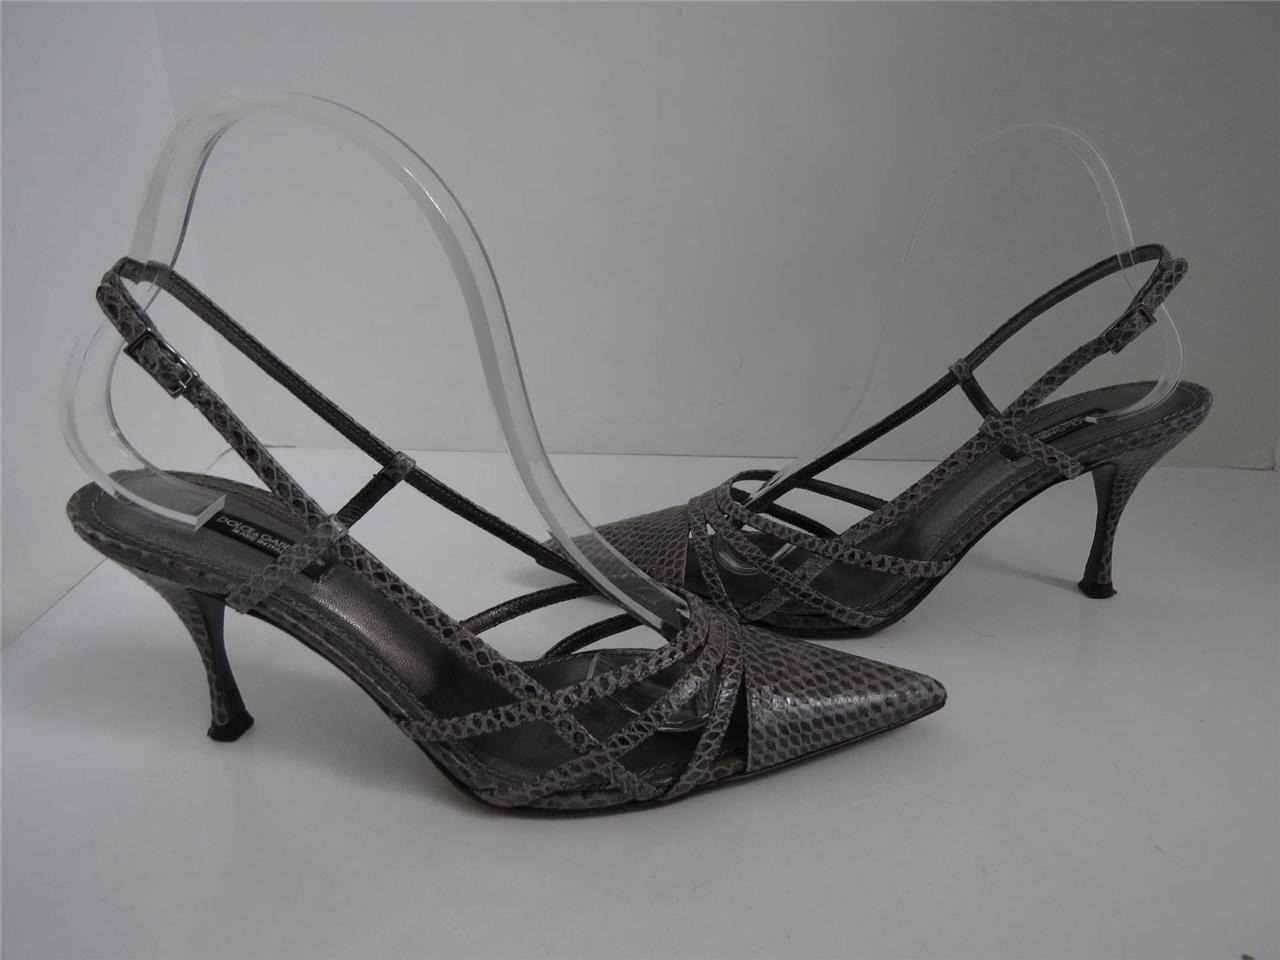 Dolce & Gabbana Grau Python Slingback/Heels/Schuhes Größe 38.5